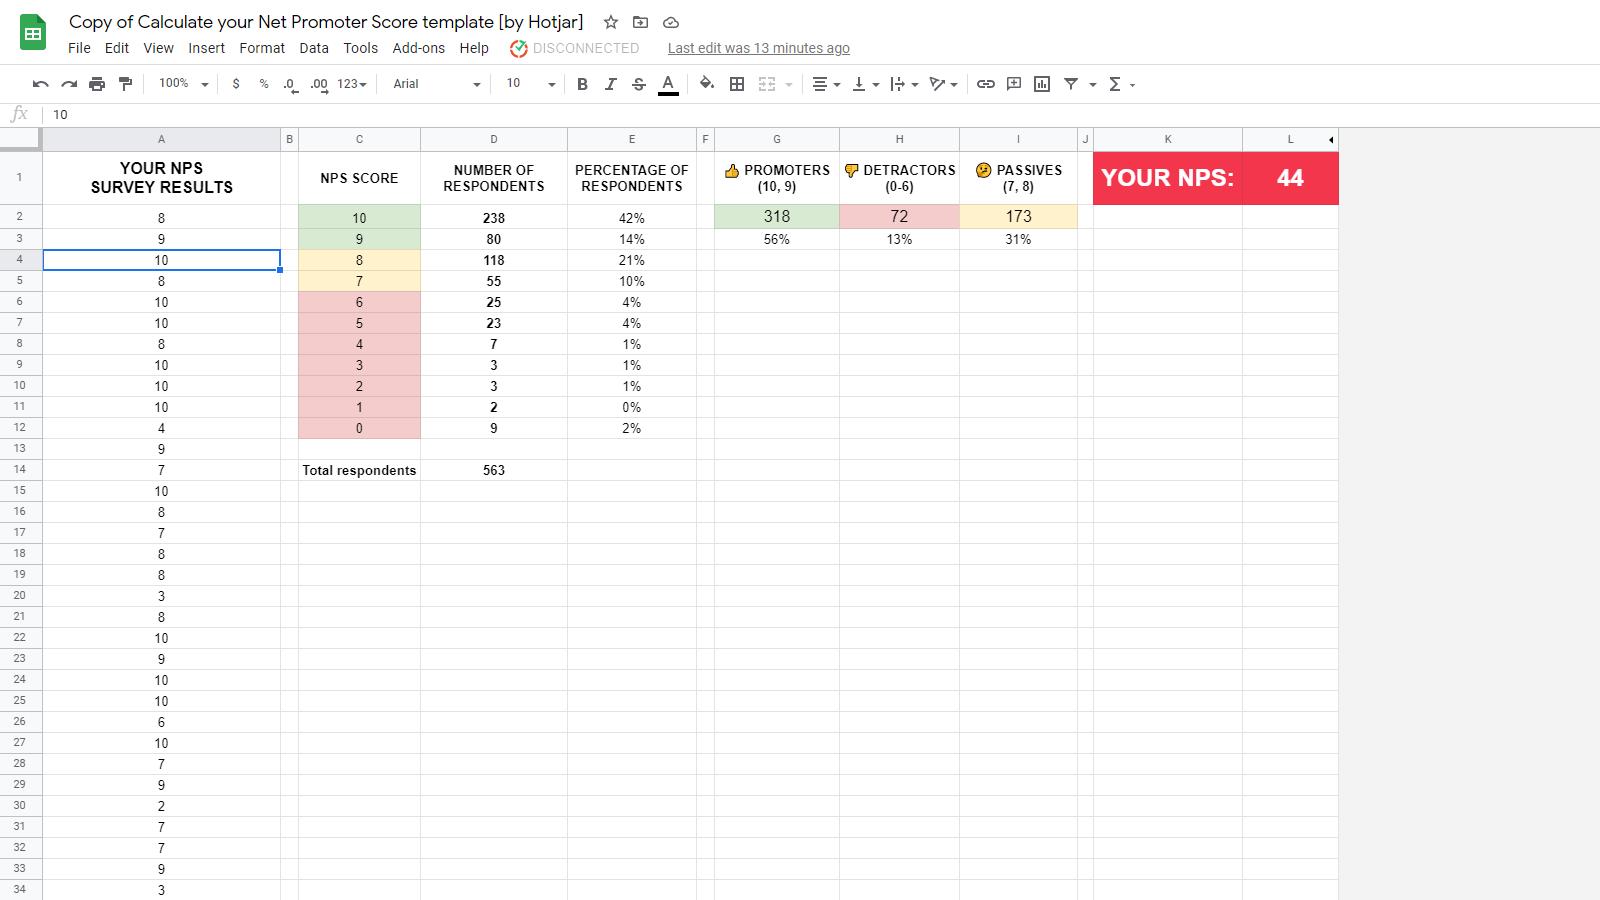 Net Promoter Score template